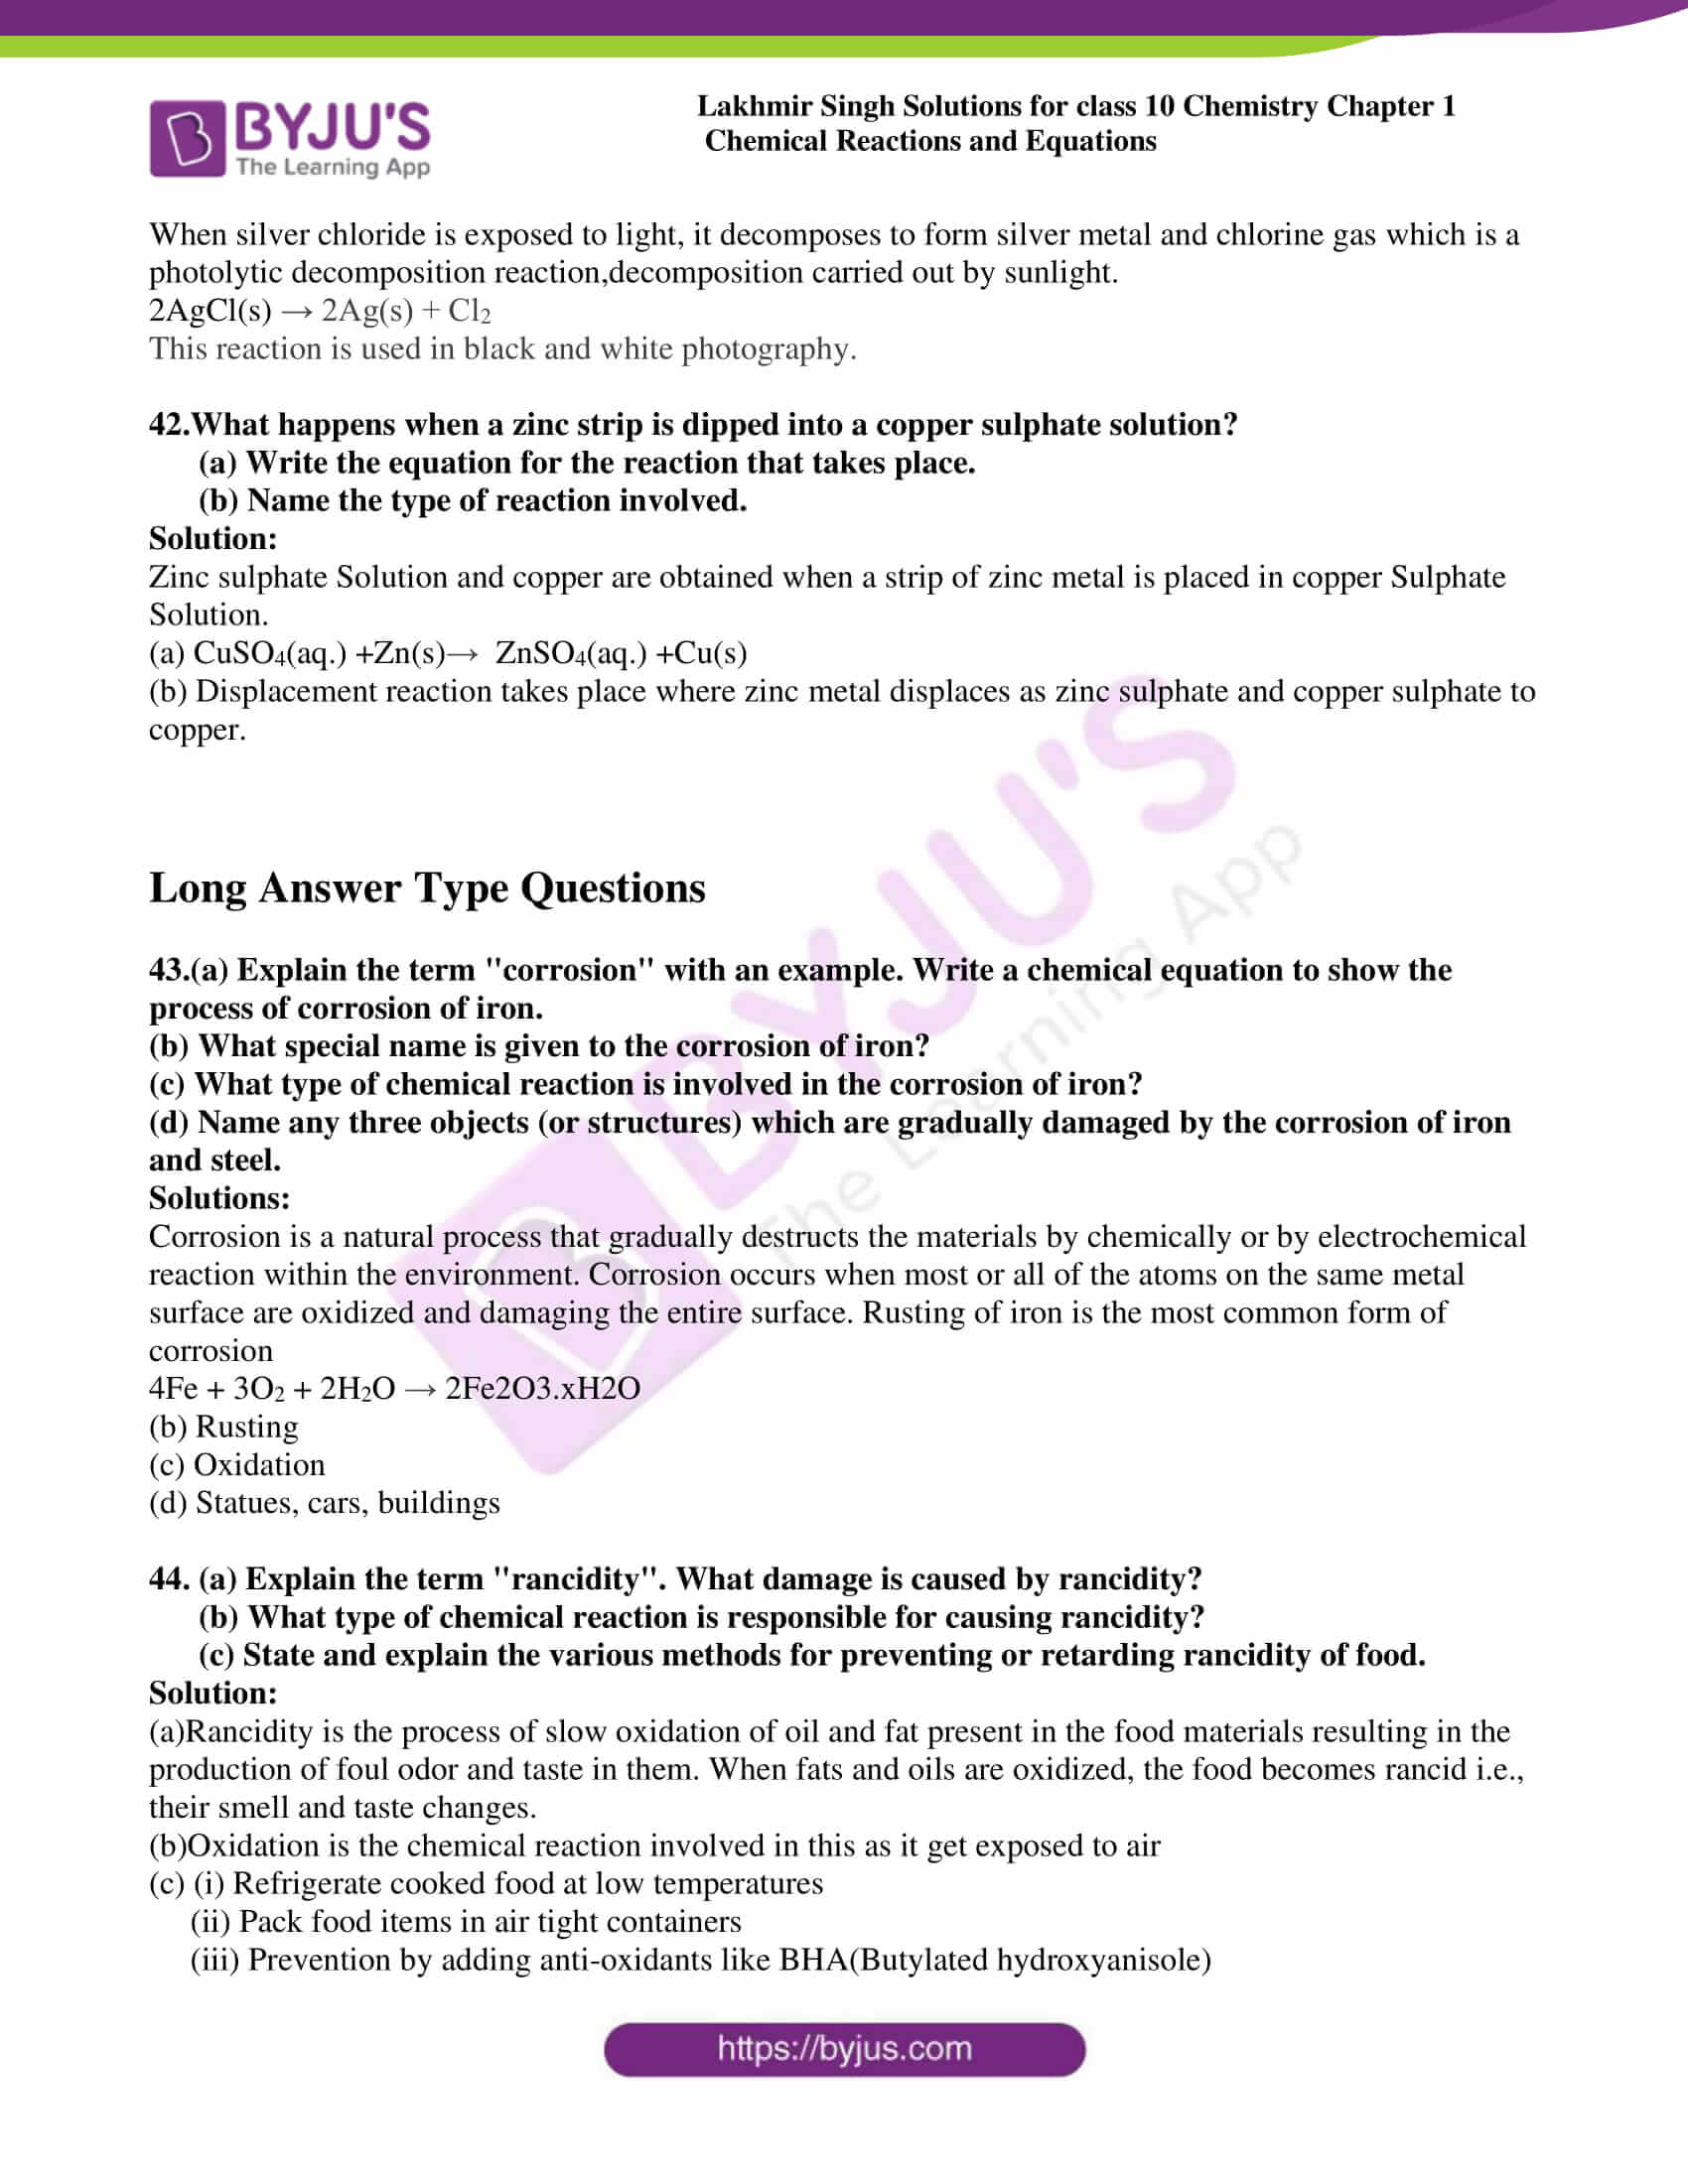 lakhmir singh sol class 10 che chapter 1 25